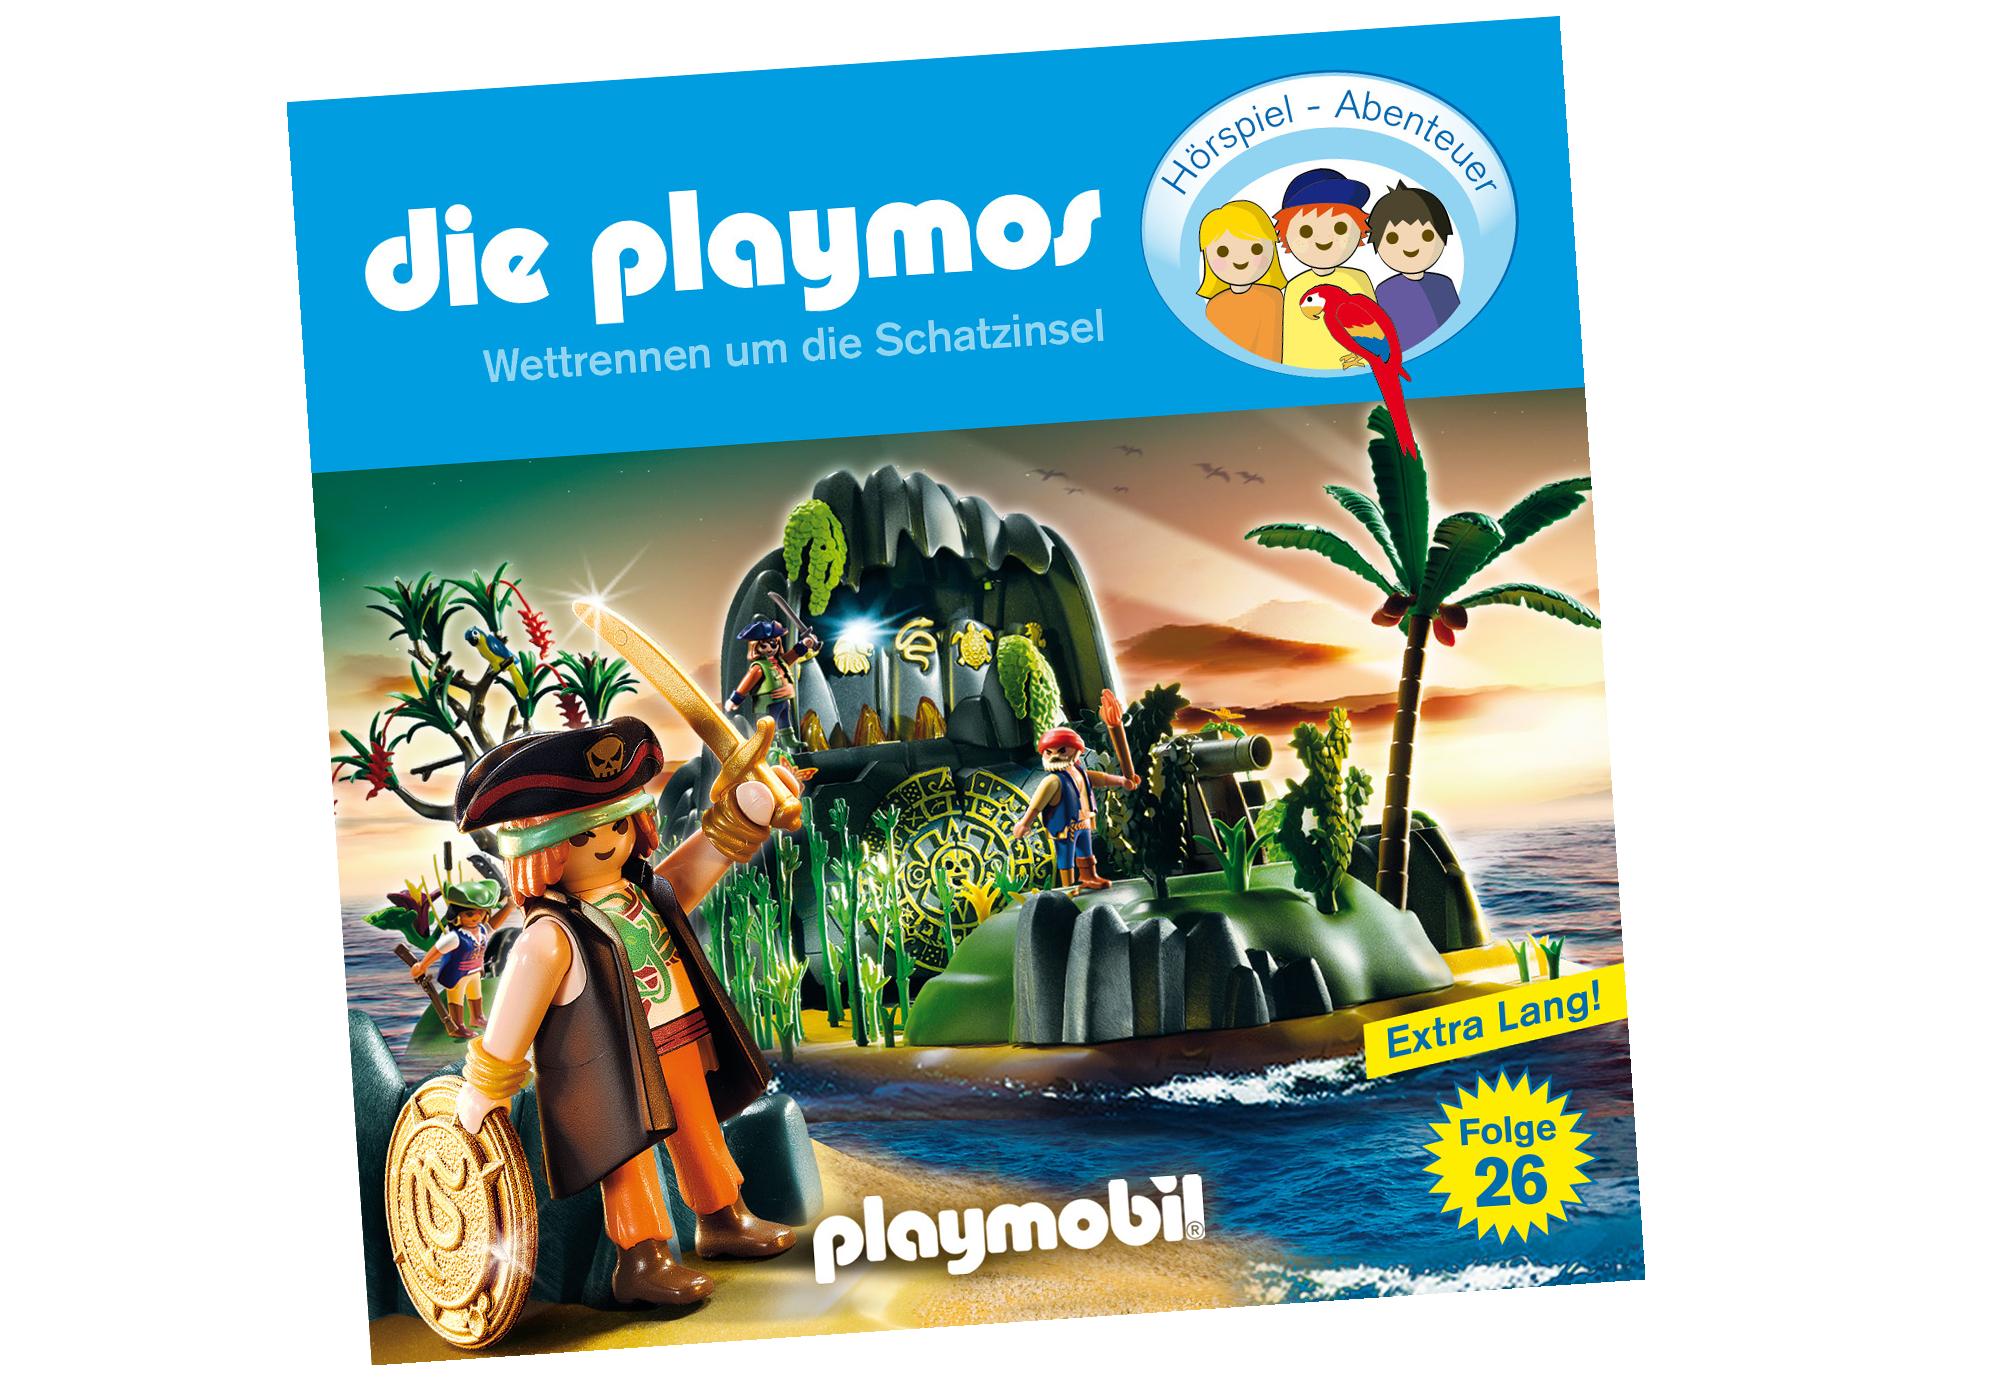 http://media.playmobil.com/i/playmobil/80332_product_detail